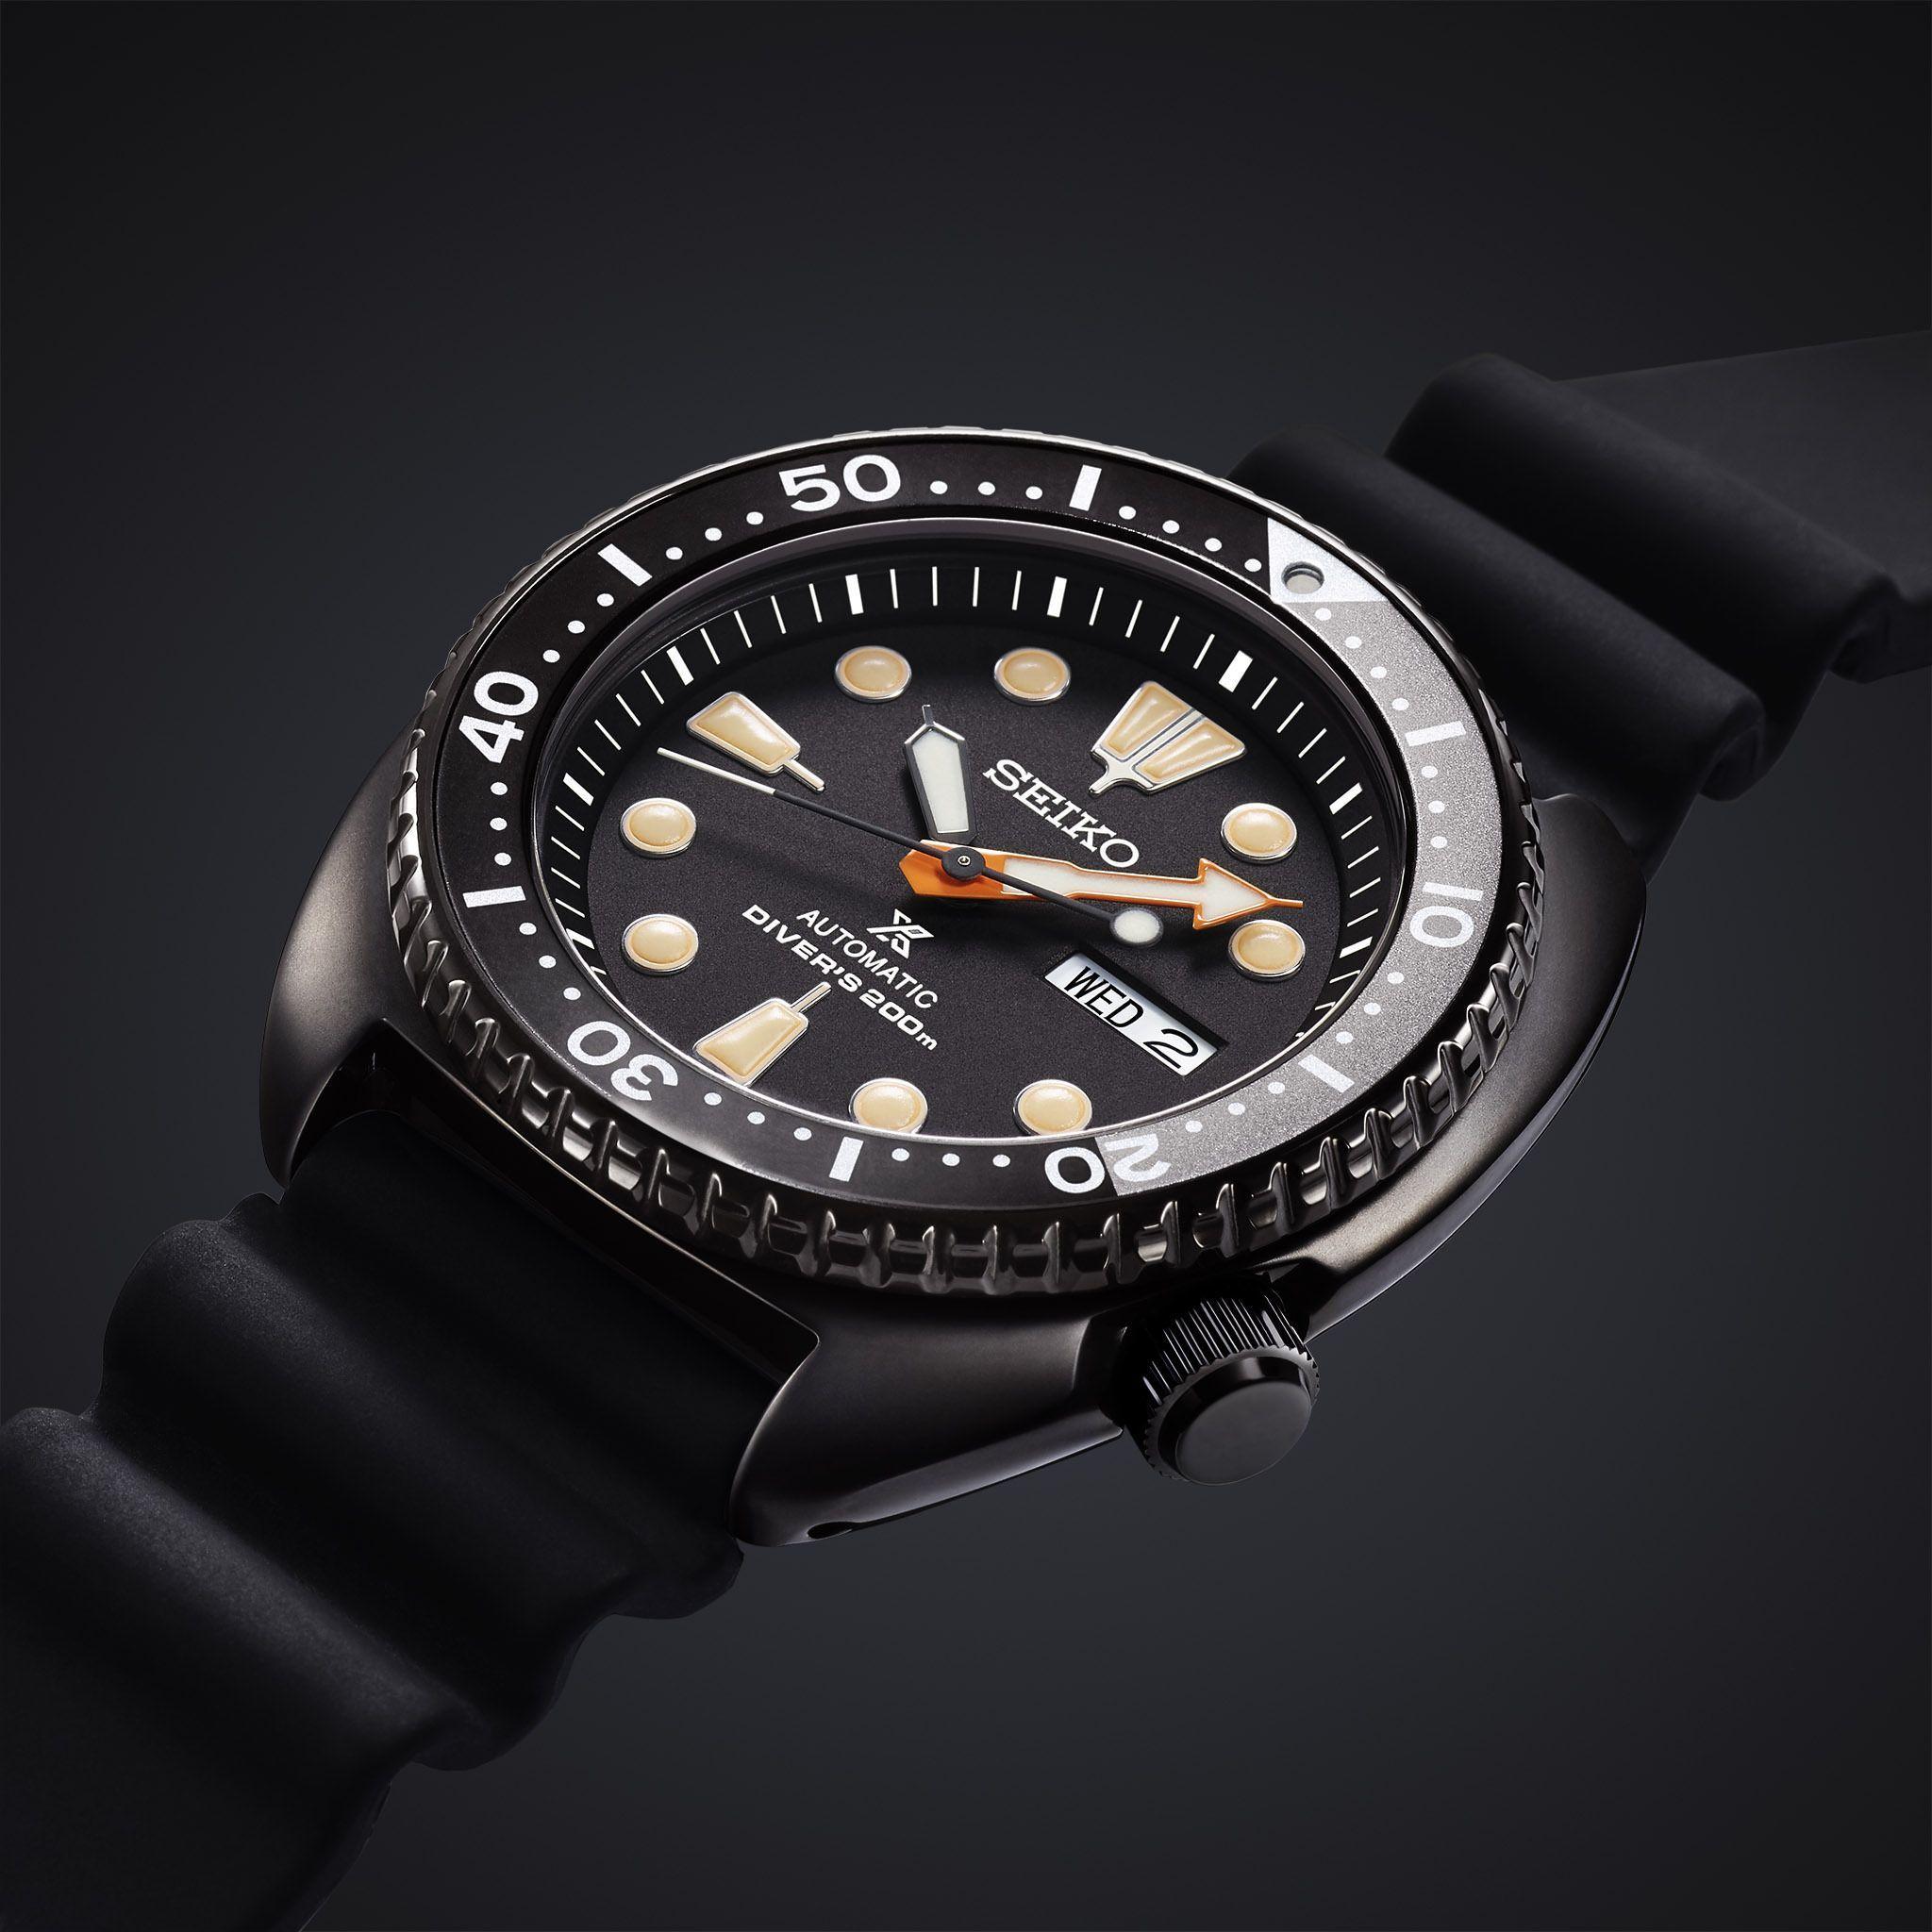 Buying The Right Type Of Mens Watches | Seiko uhren, Uhren